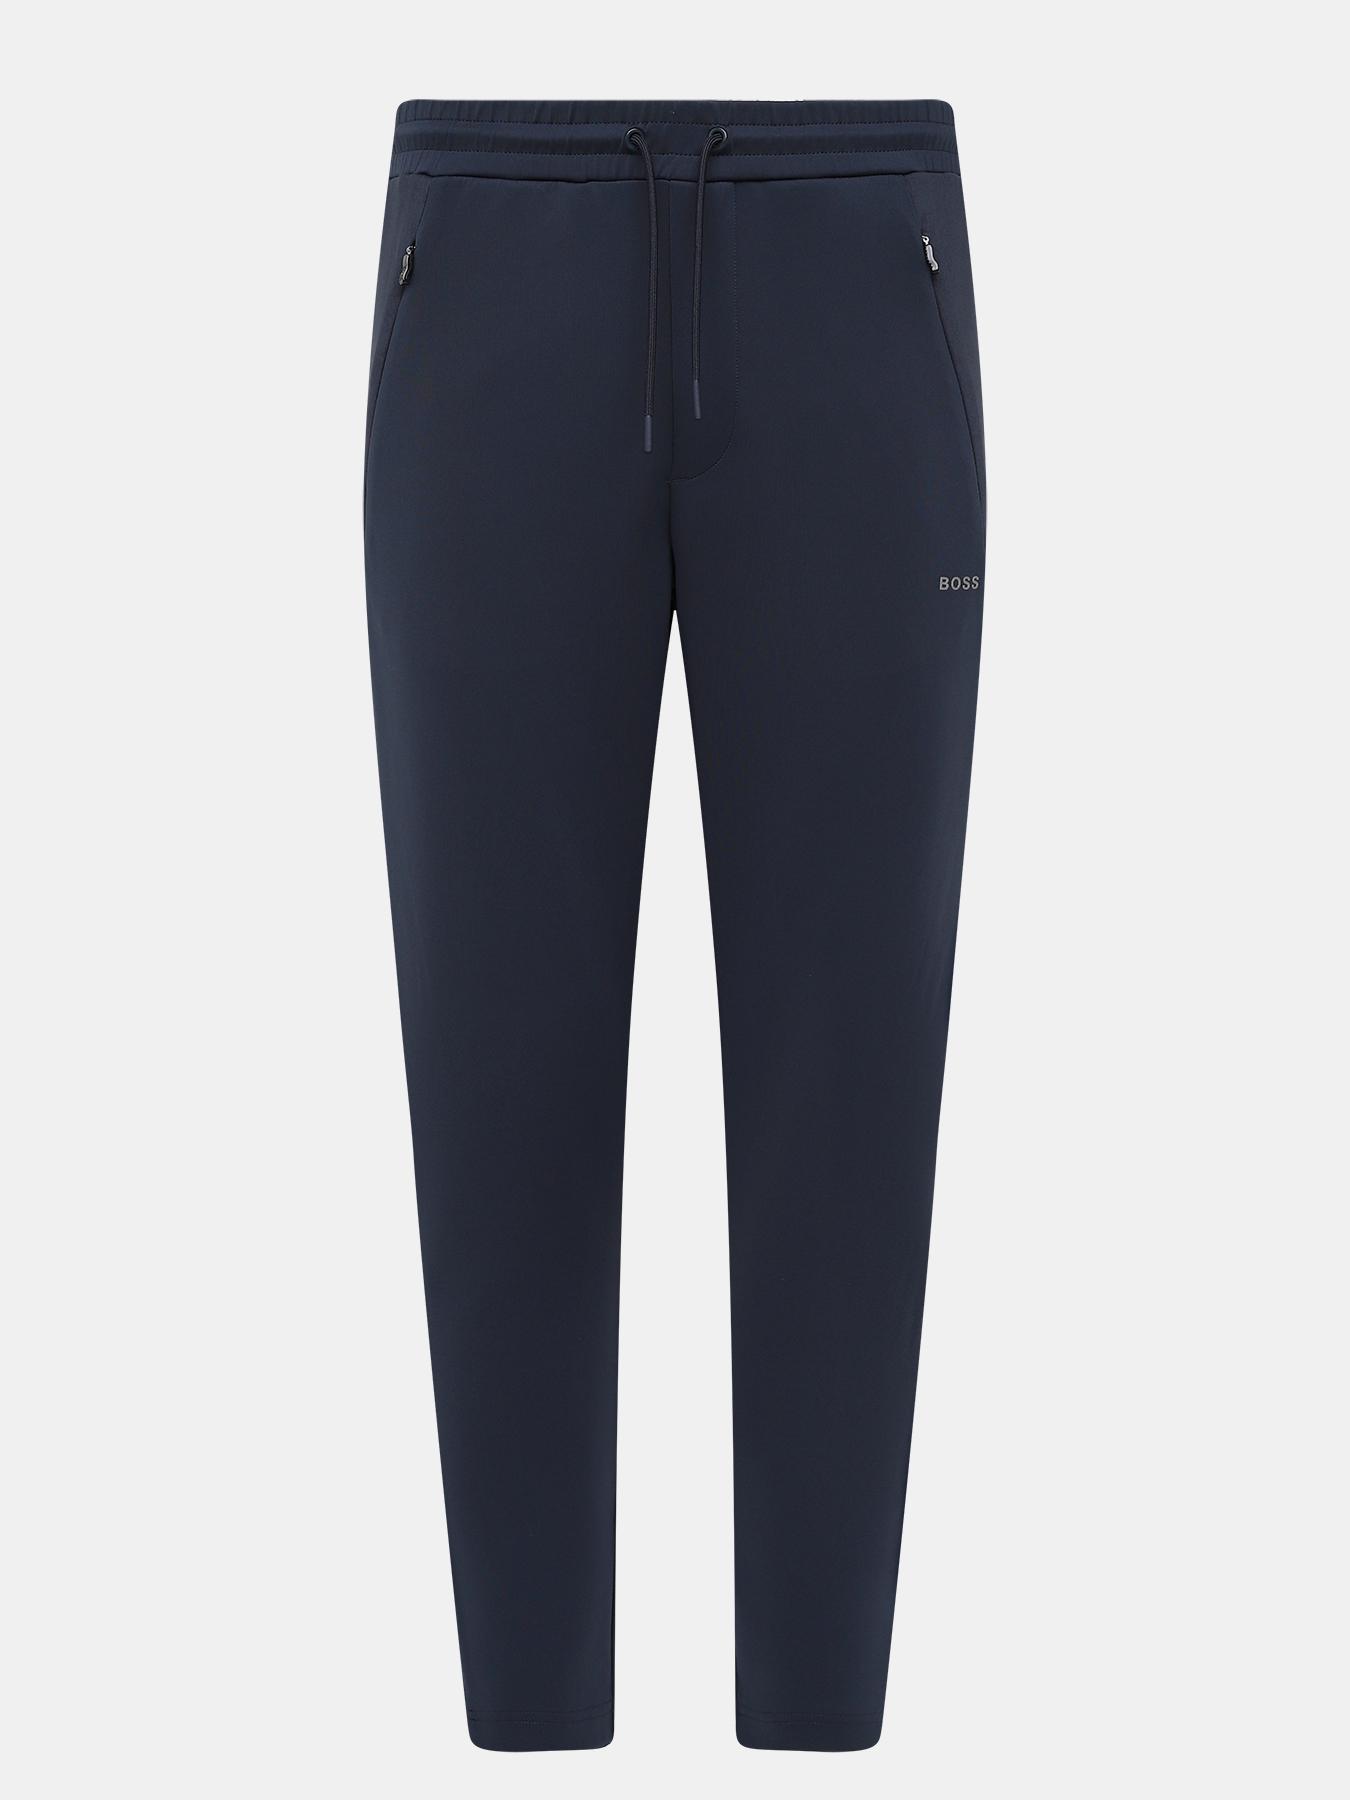 Спортивные брюки BOSS Брюки Hicon брюки boss брюки на резинке banks